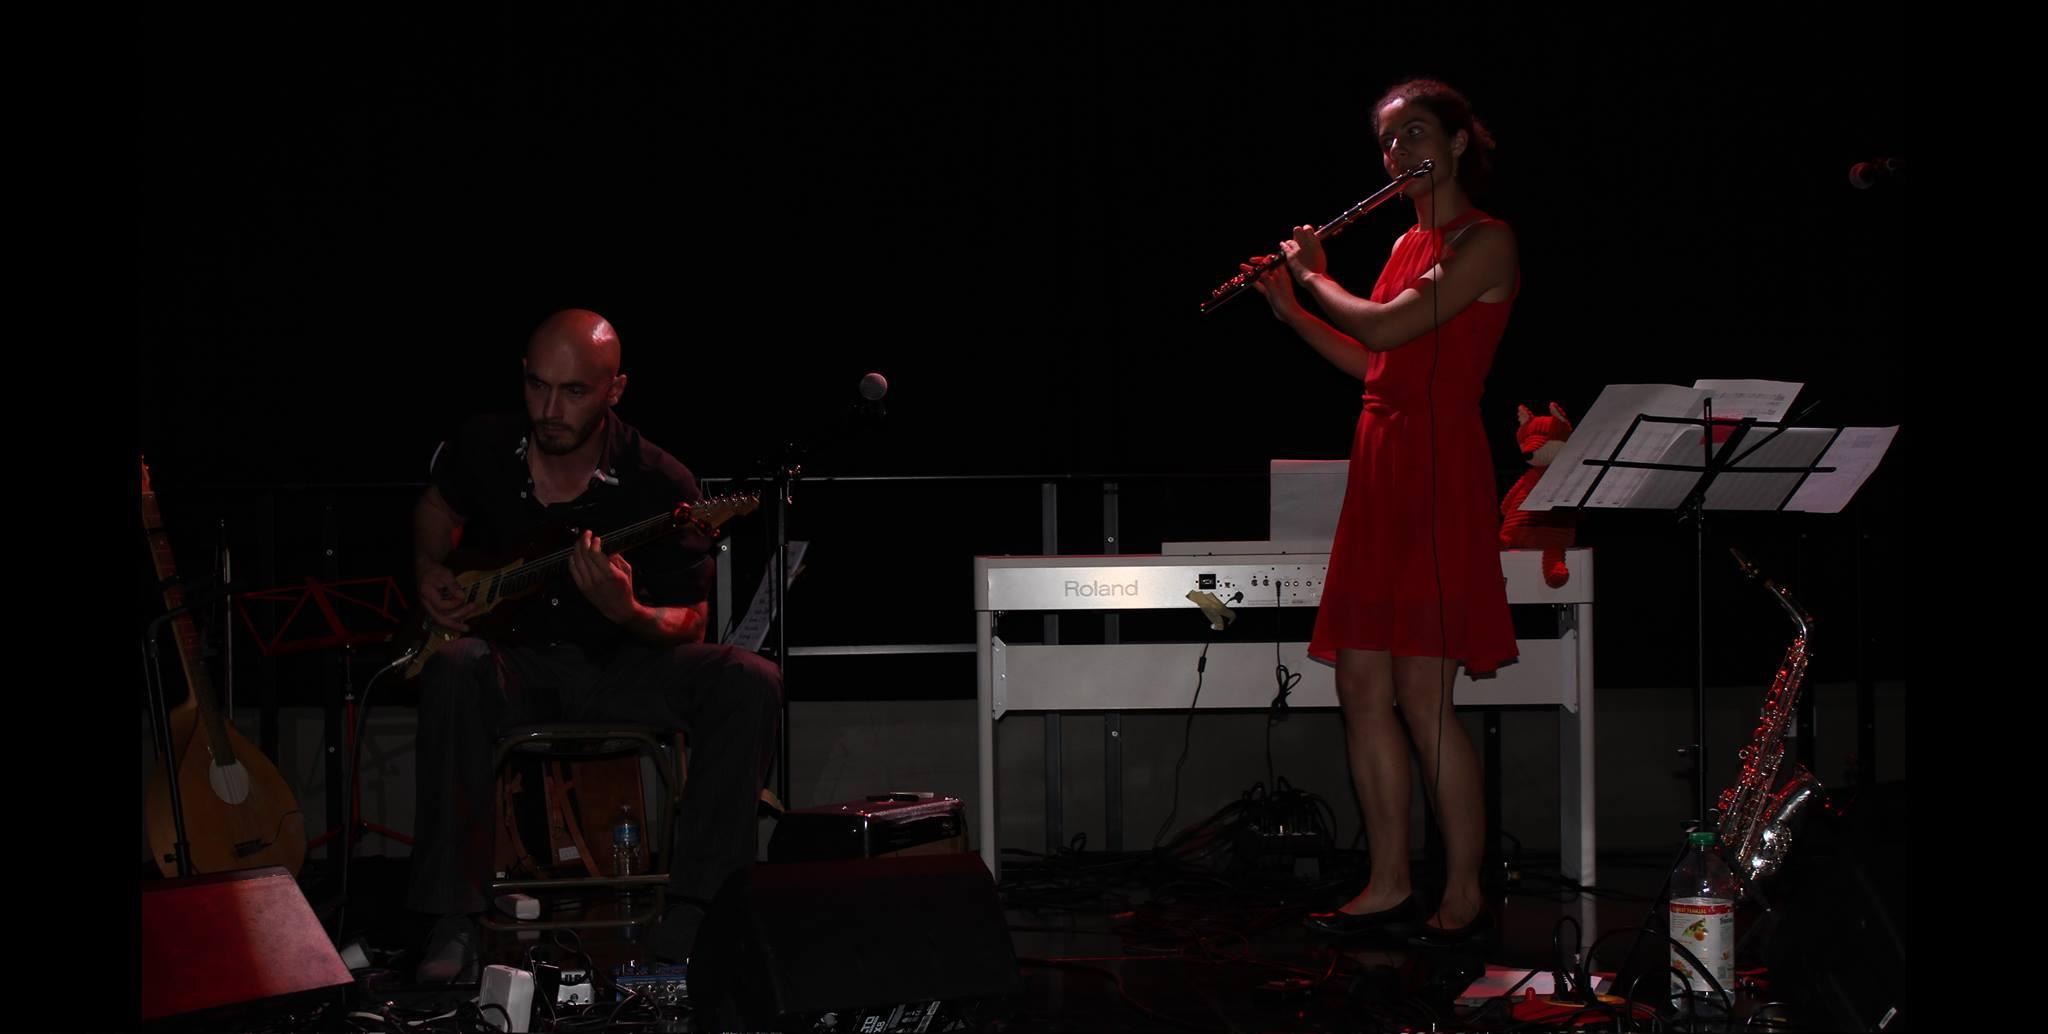 Jeudi 8 mars 2018 : bal folk avec Duo Antithèse